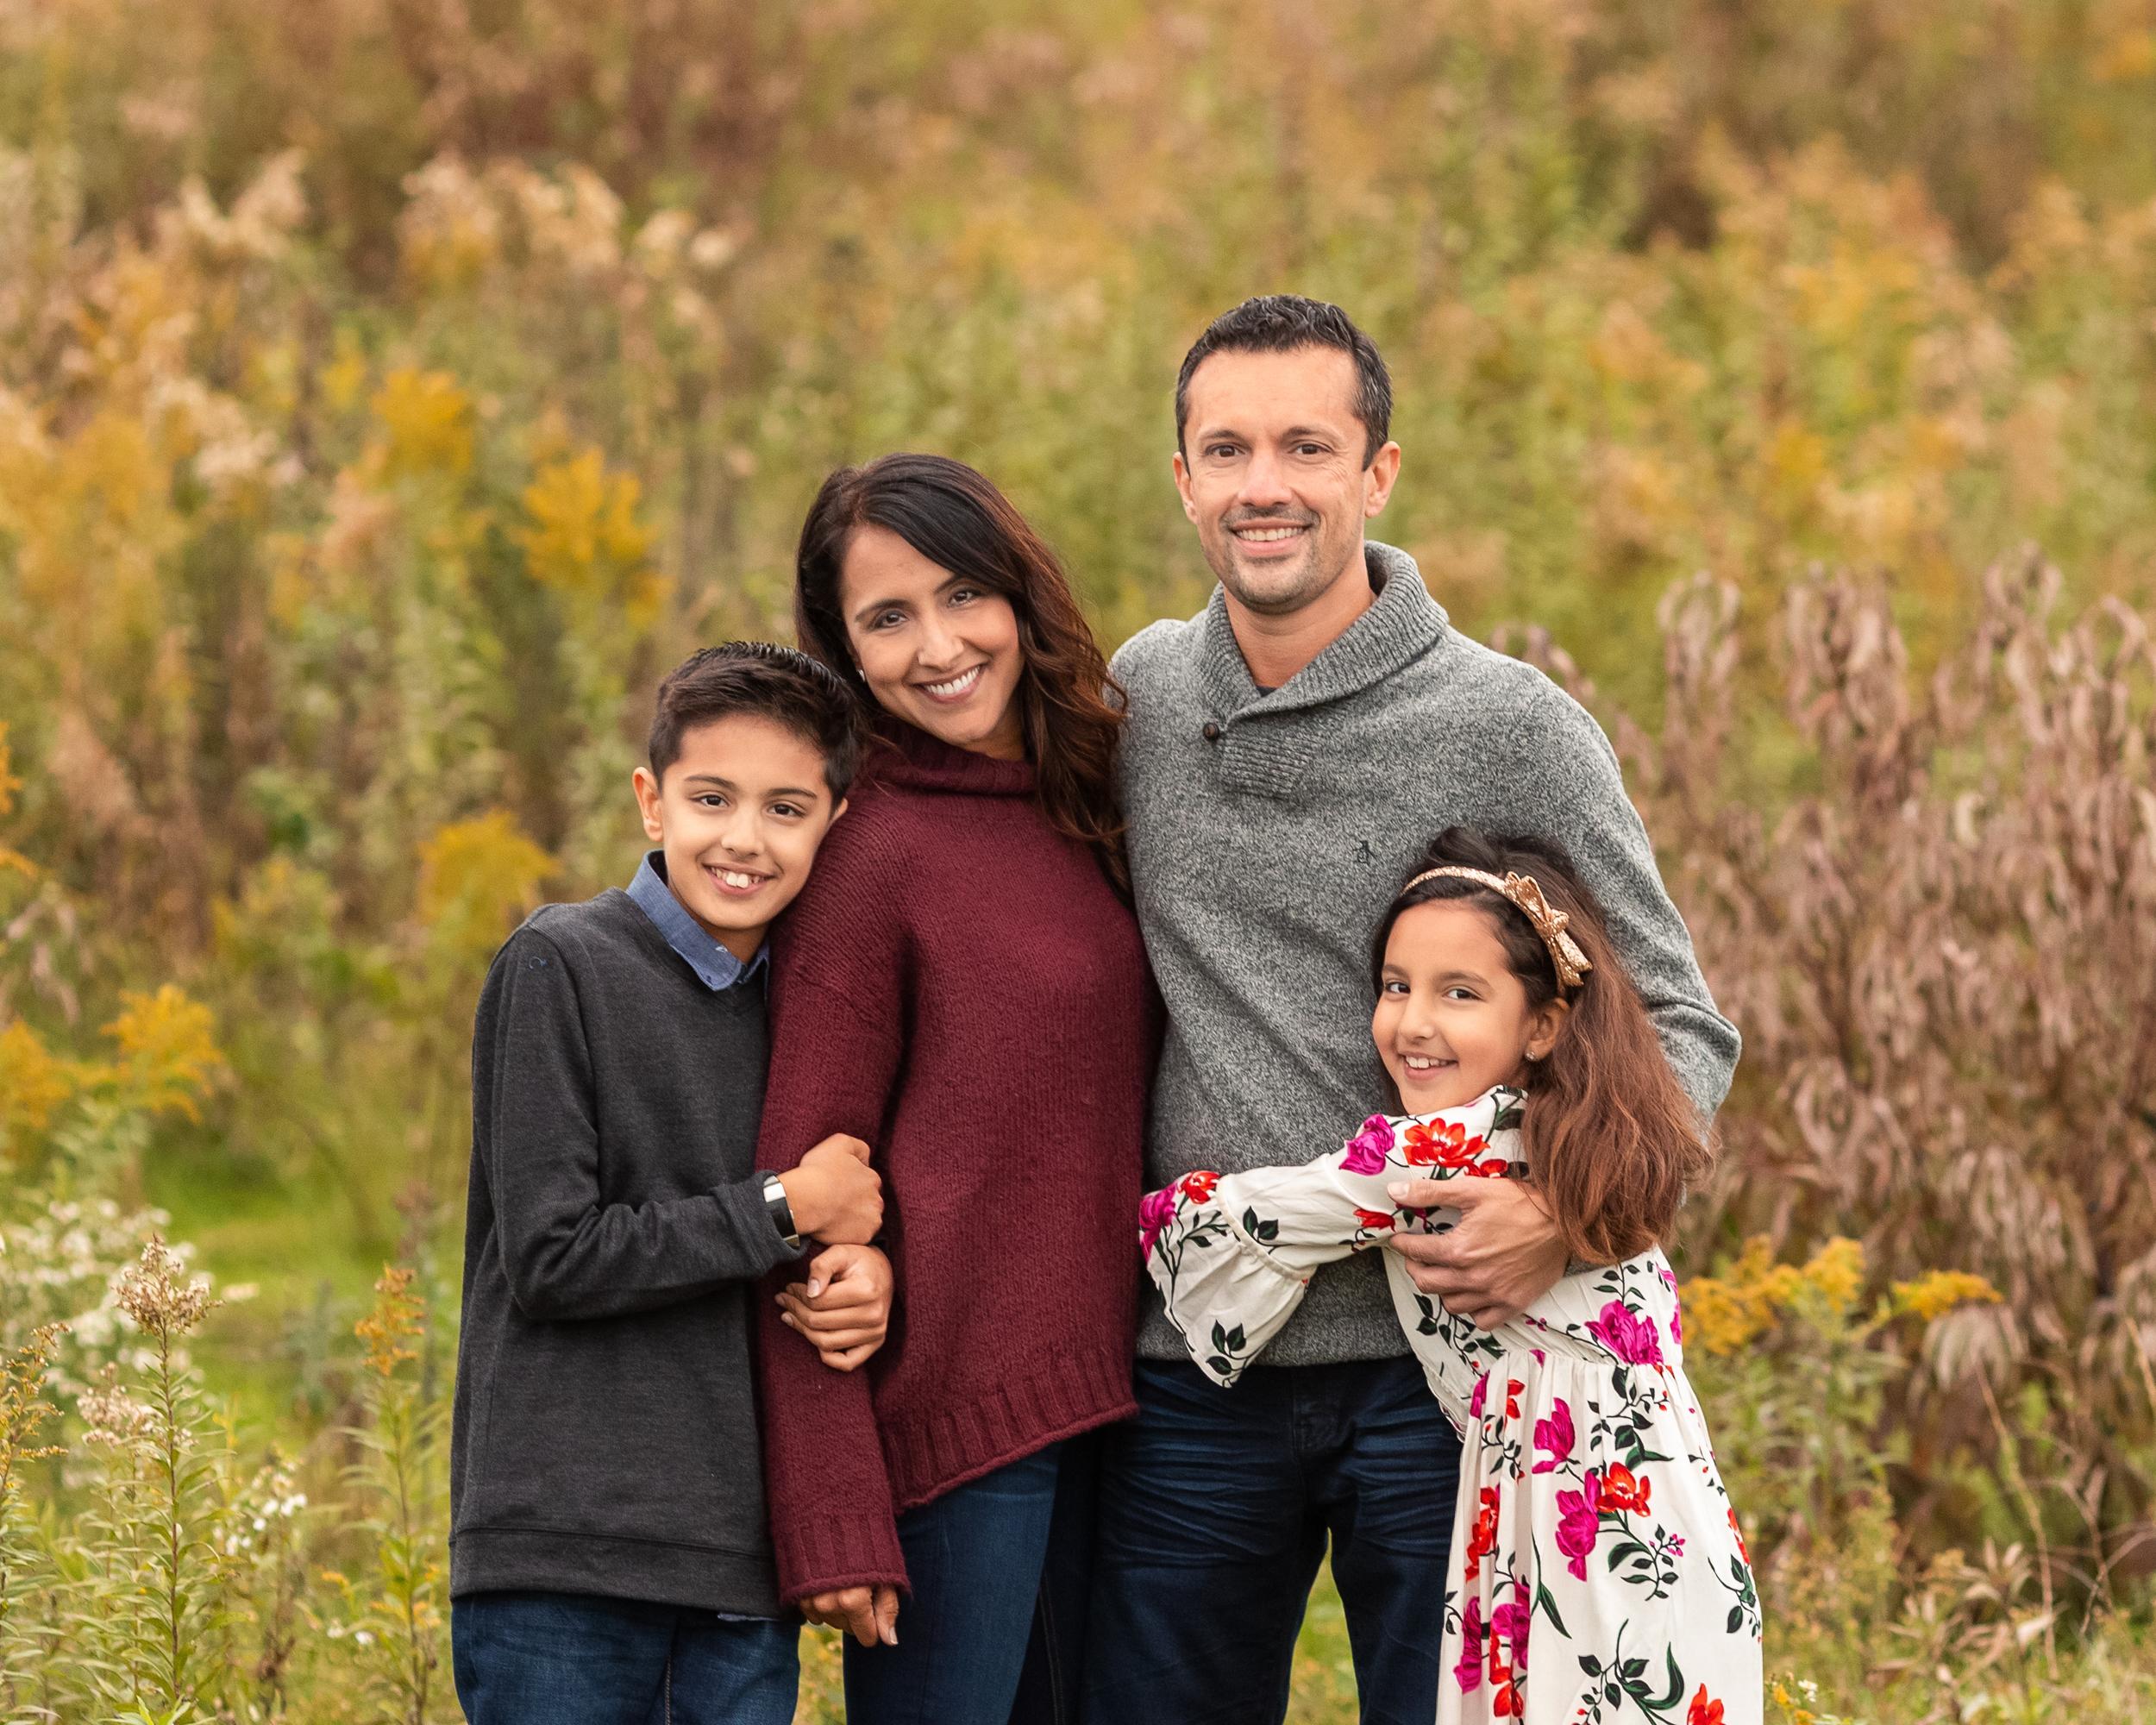 NicolaLevinePhotography_ChicagoNorthshoreFamilyPhotographer, Chicagofamilyphotographer, Deerfieldfamilyphotographer-1-2.jpg